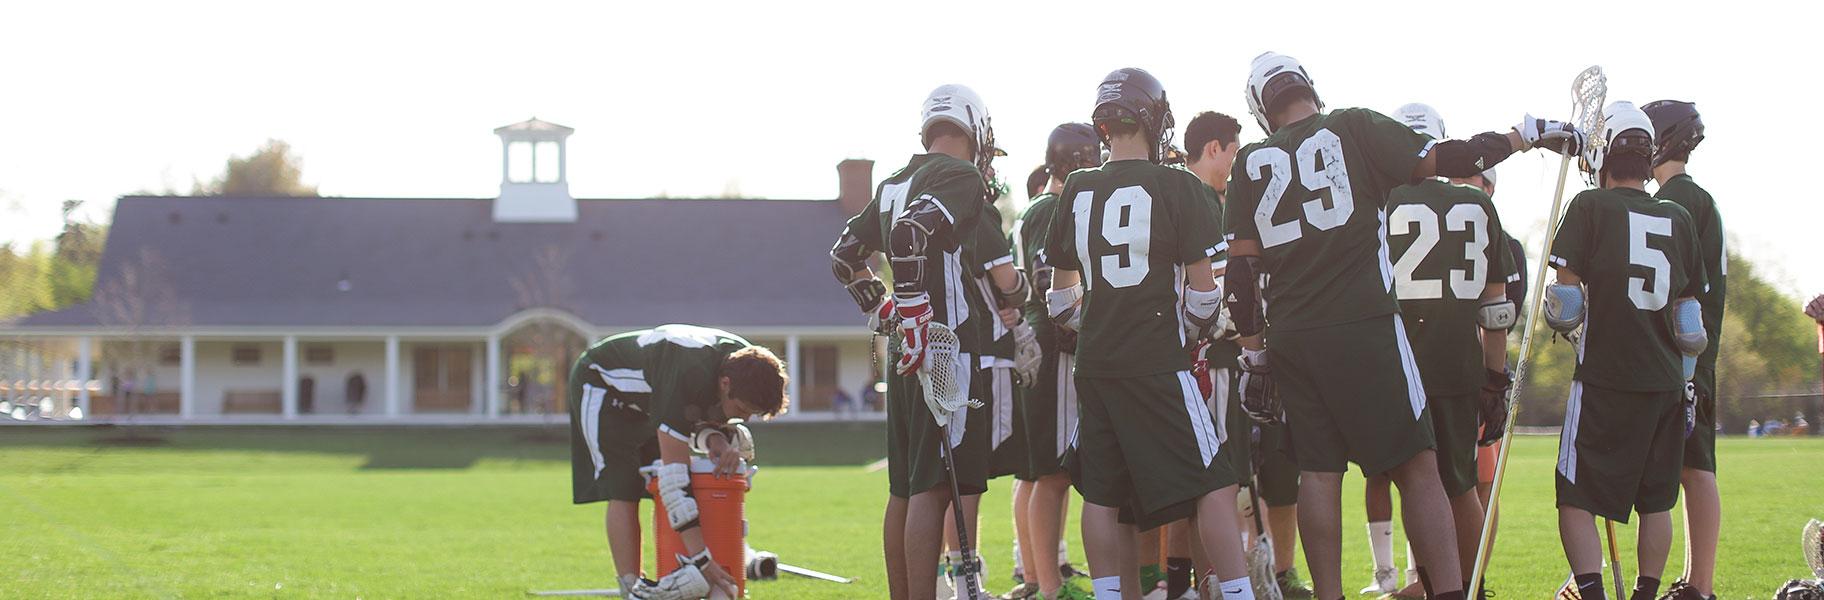 Boys Varsity Lacrosse at Concord Academy